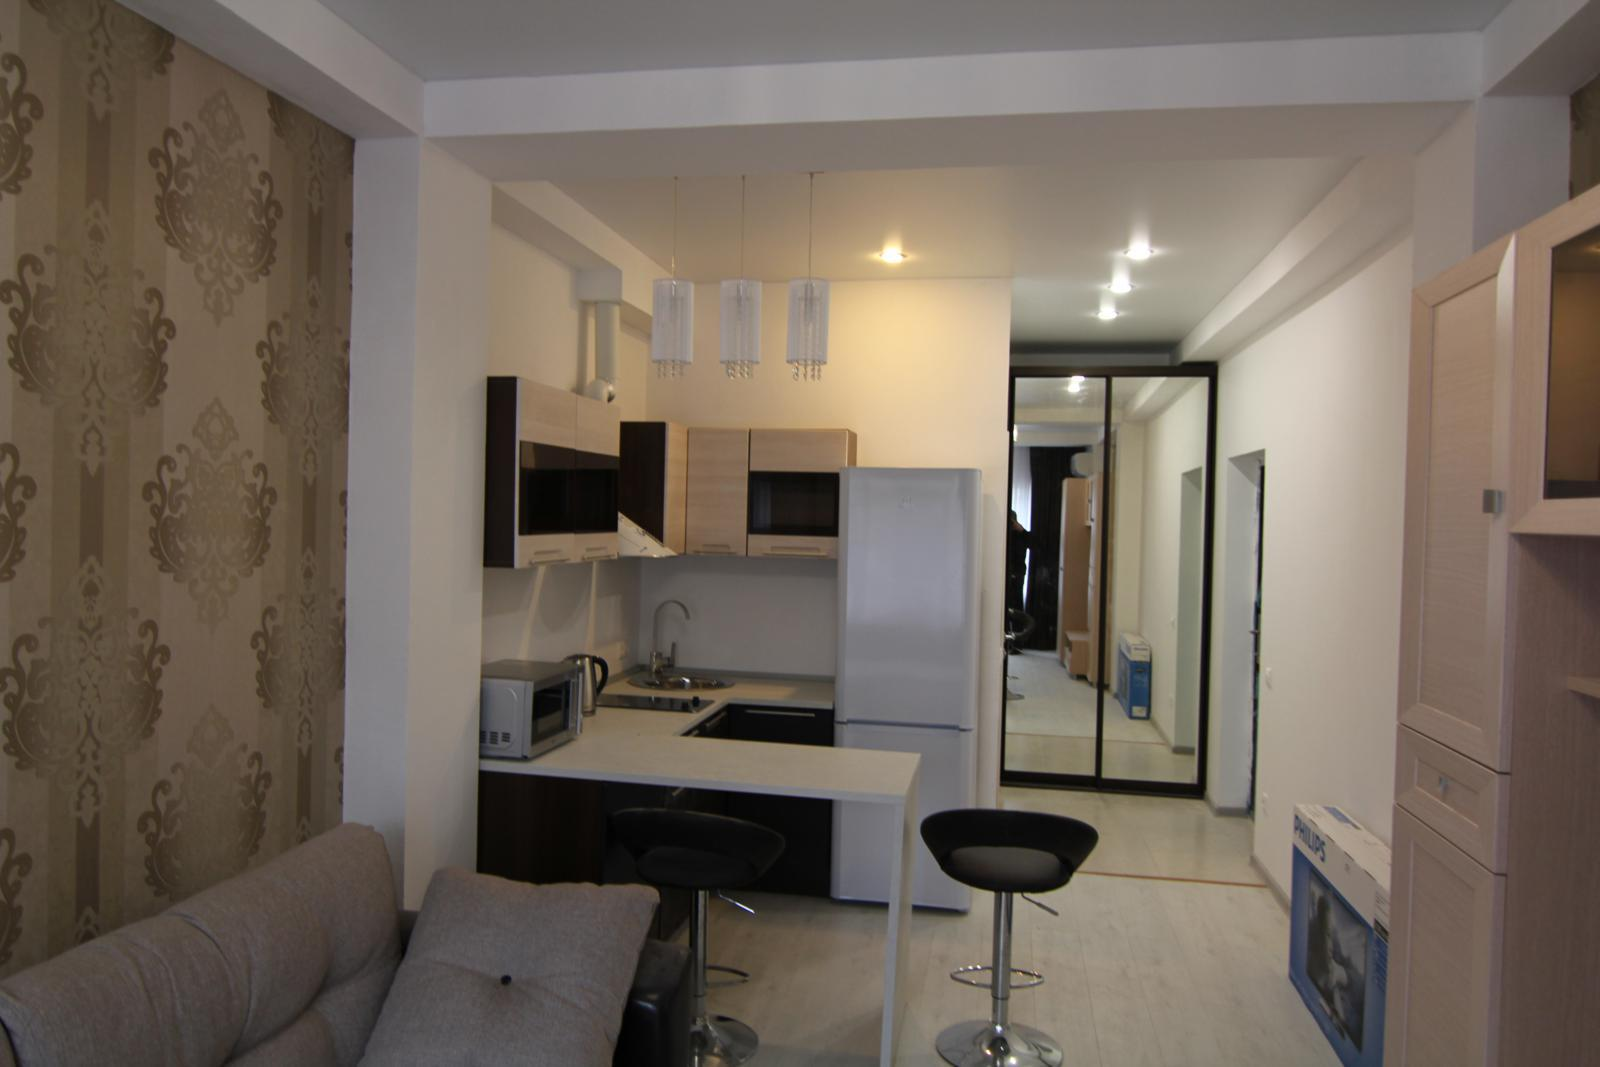 маленькая ванная комната 3 кв.м дизайн фото